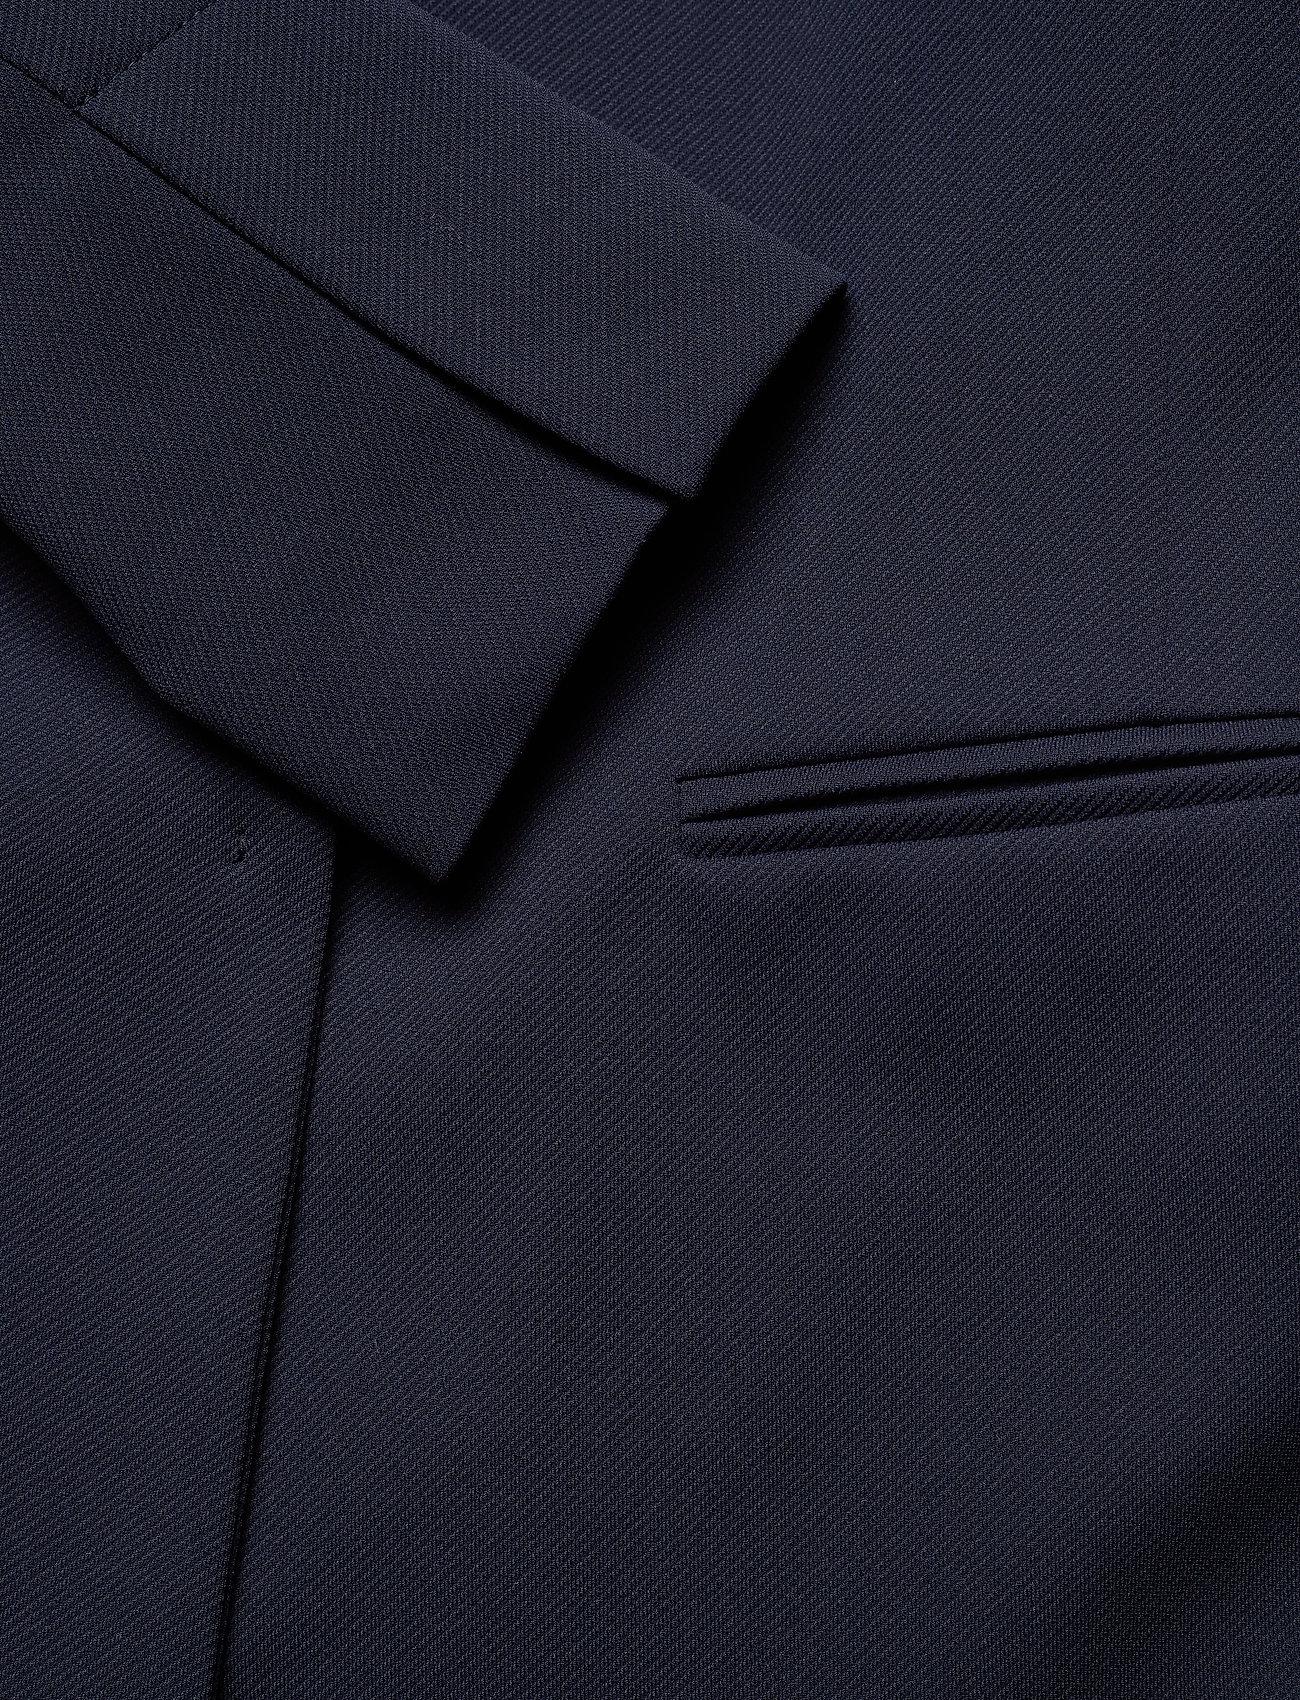 Max Mara Leisure - AIA - oversize blazers - midnightblue - 2